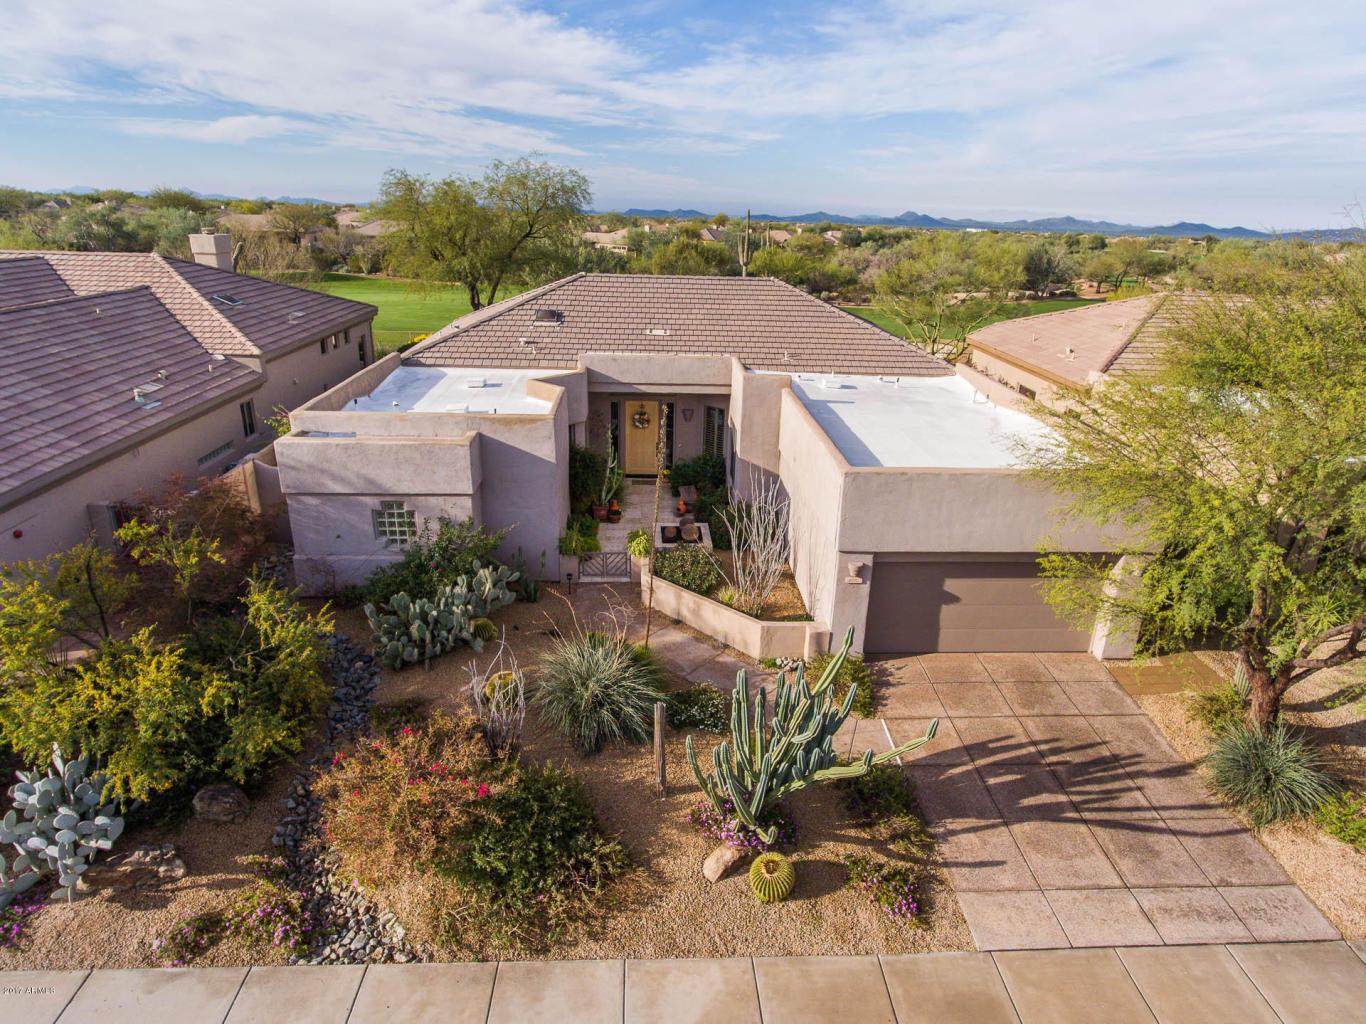 6751 E Amber Sun Dr, Scottsdale | $700,000